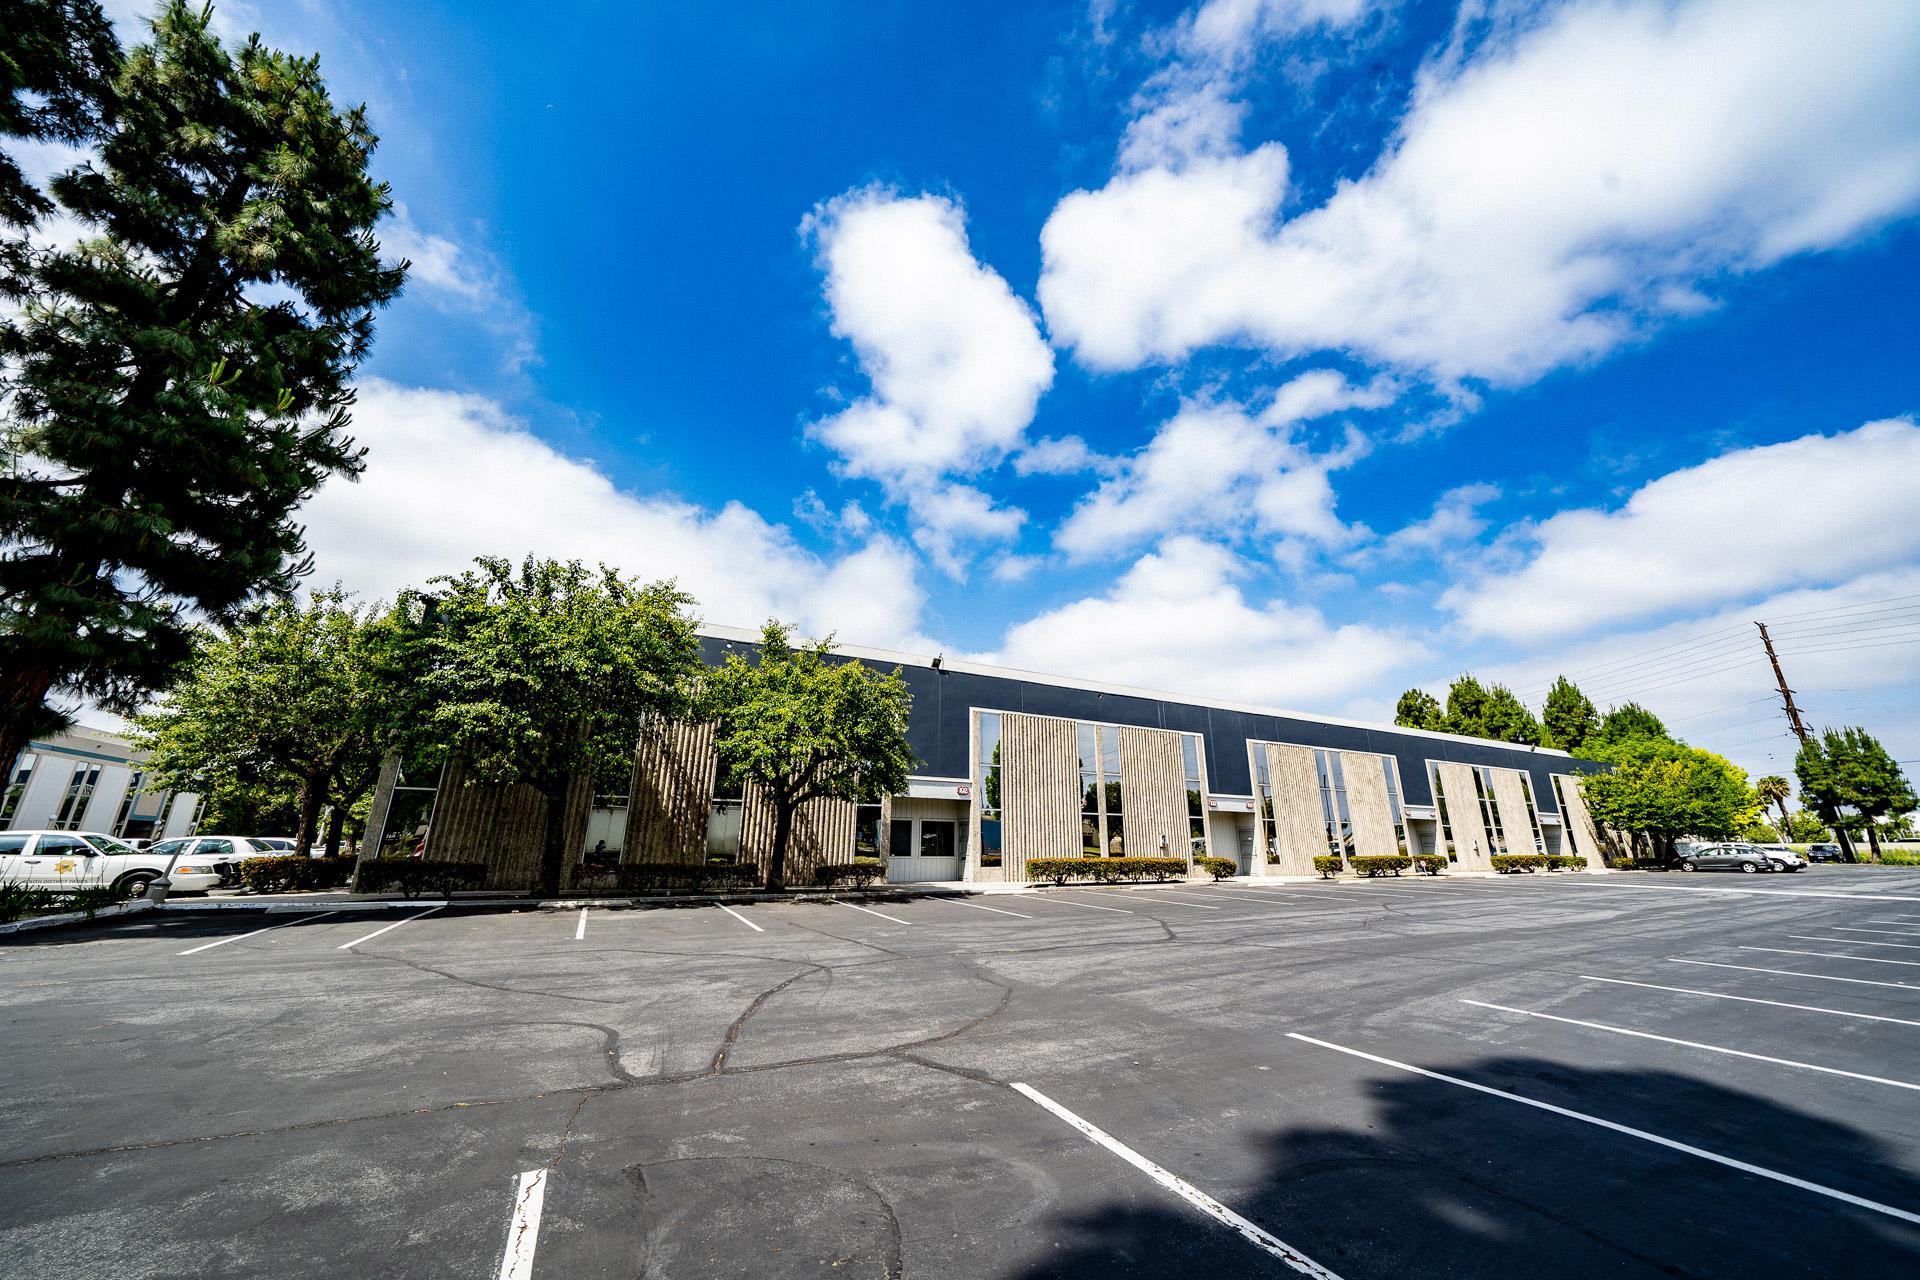 Garry Office Plaza